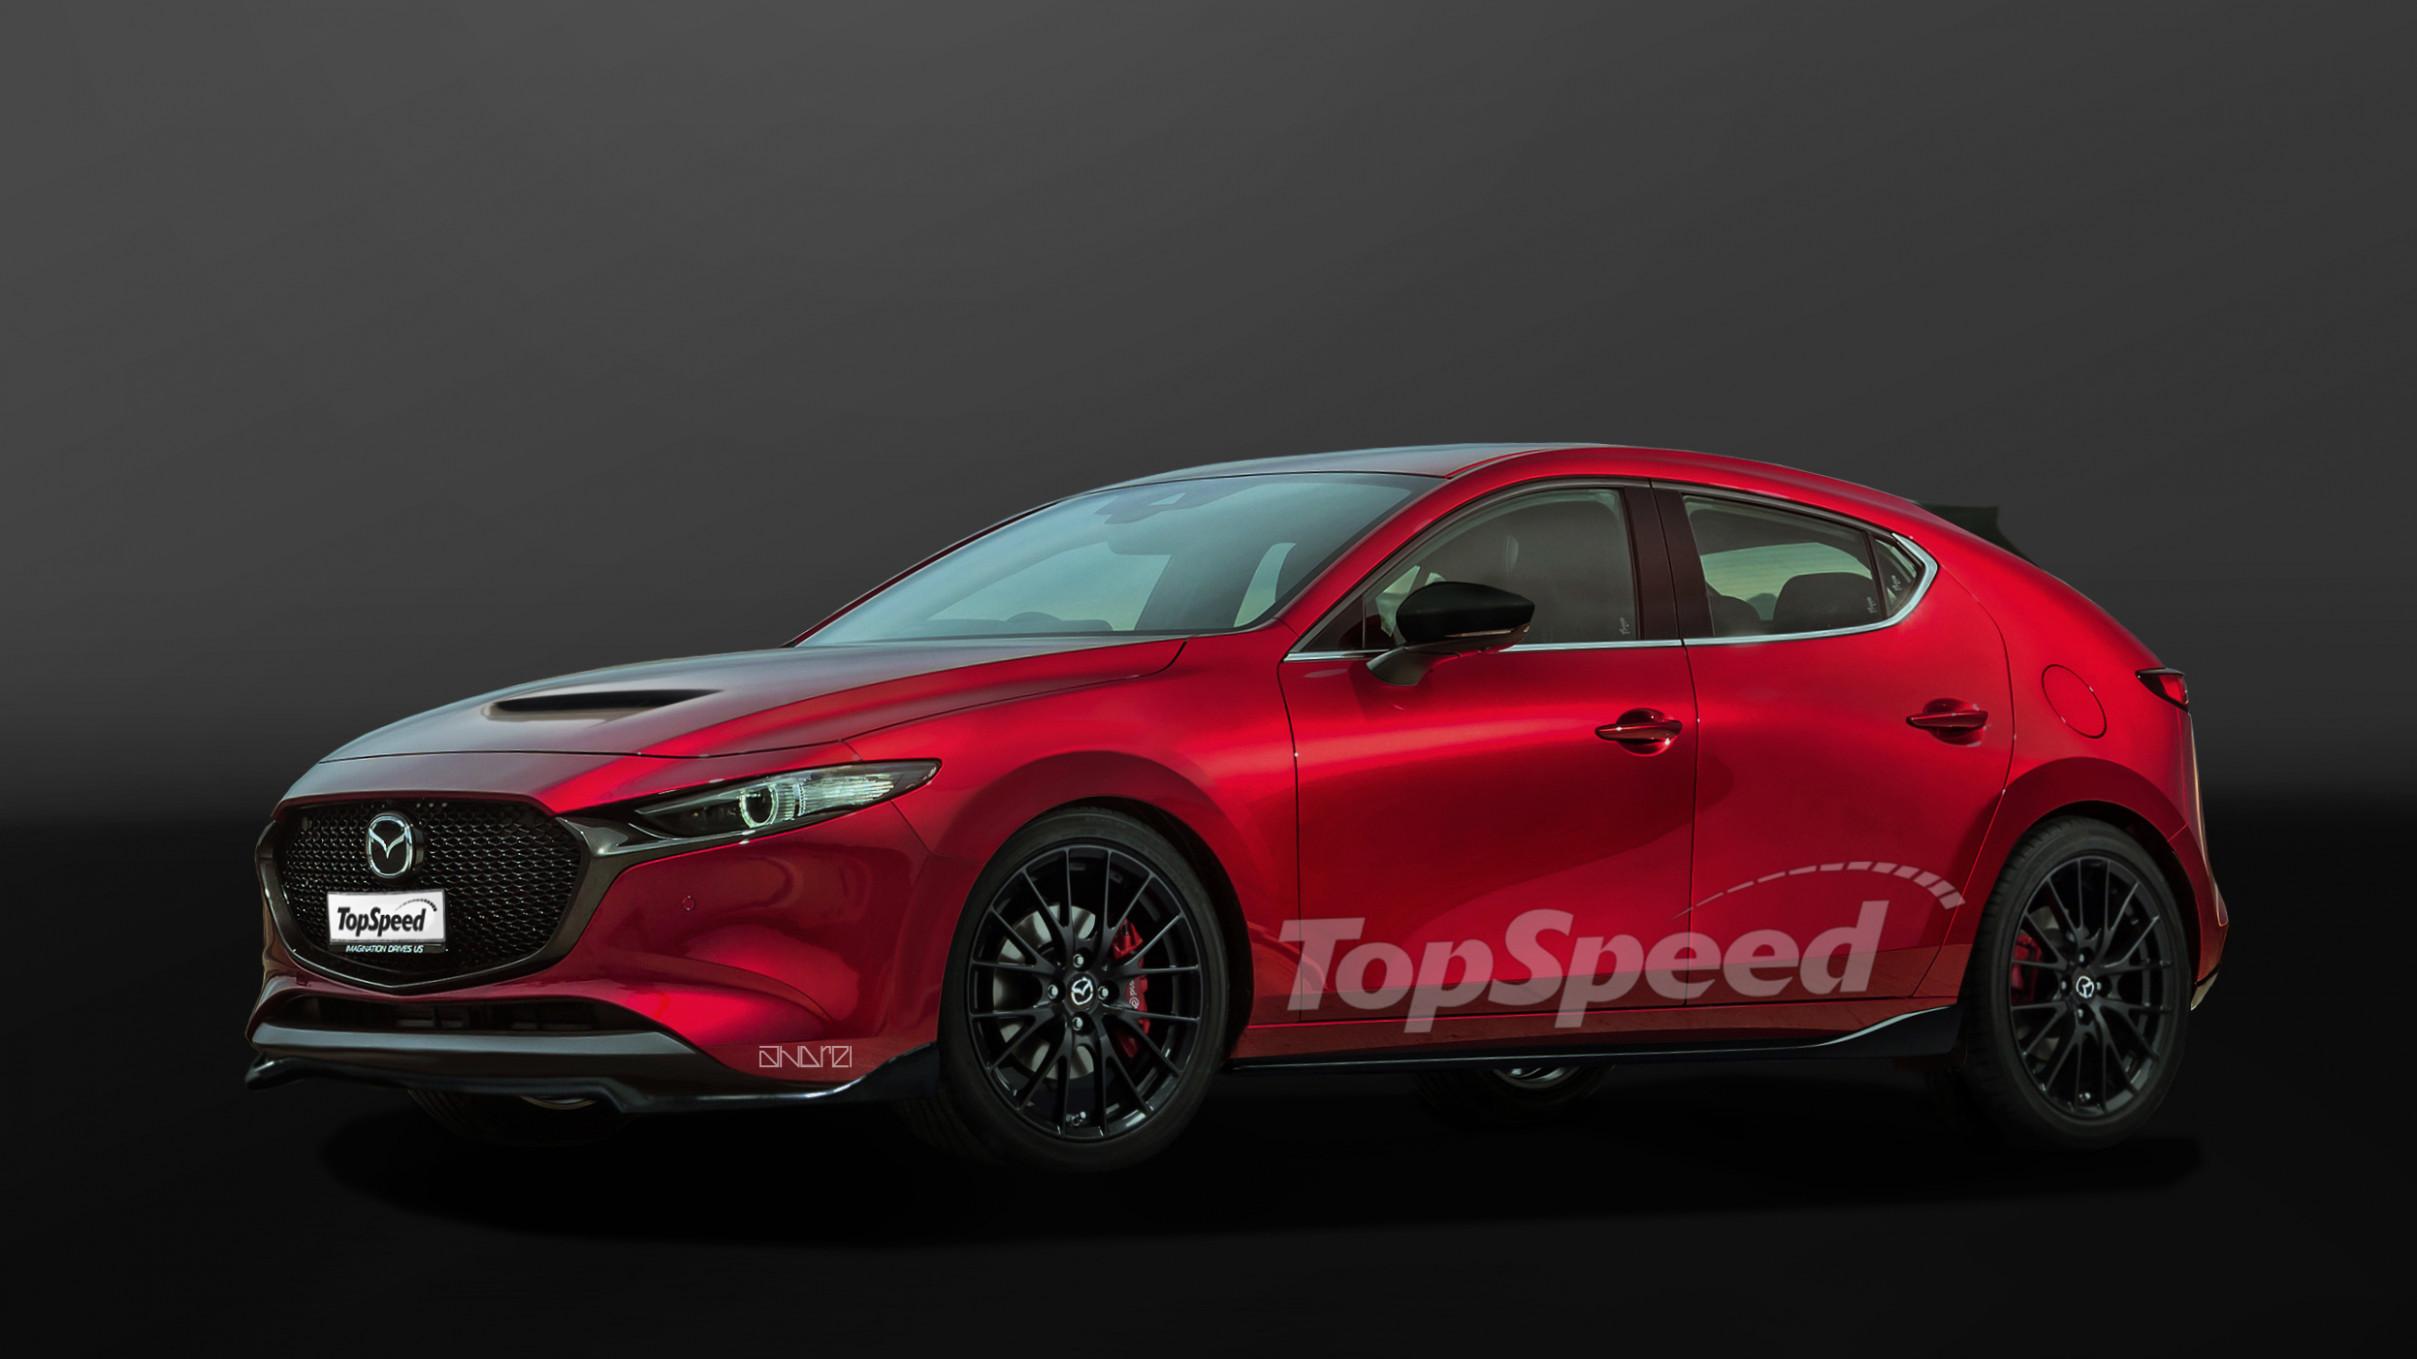 Images 2022 Mazdaspeed 3